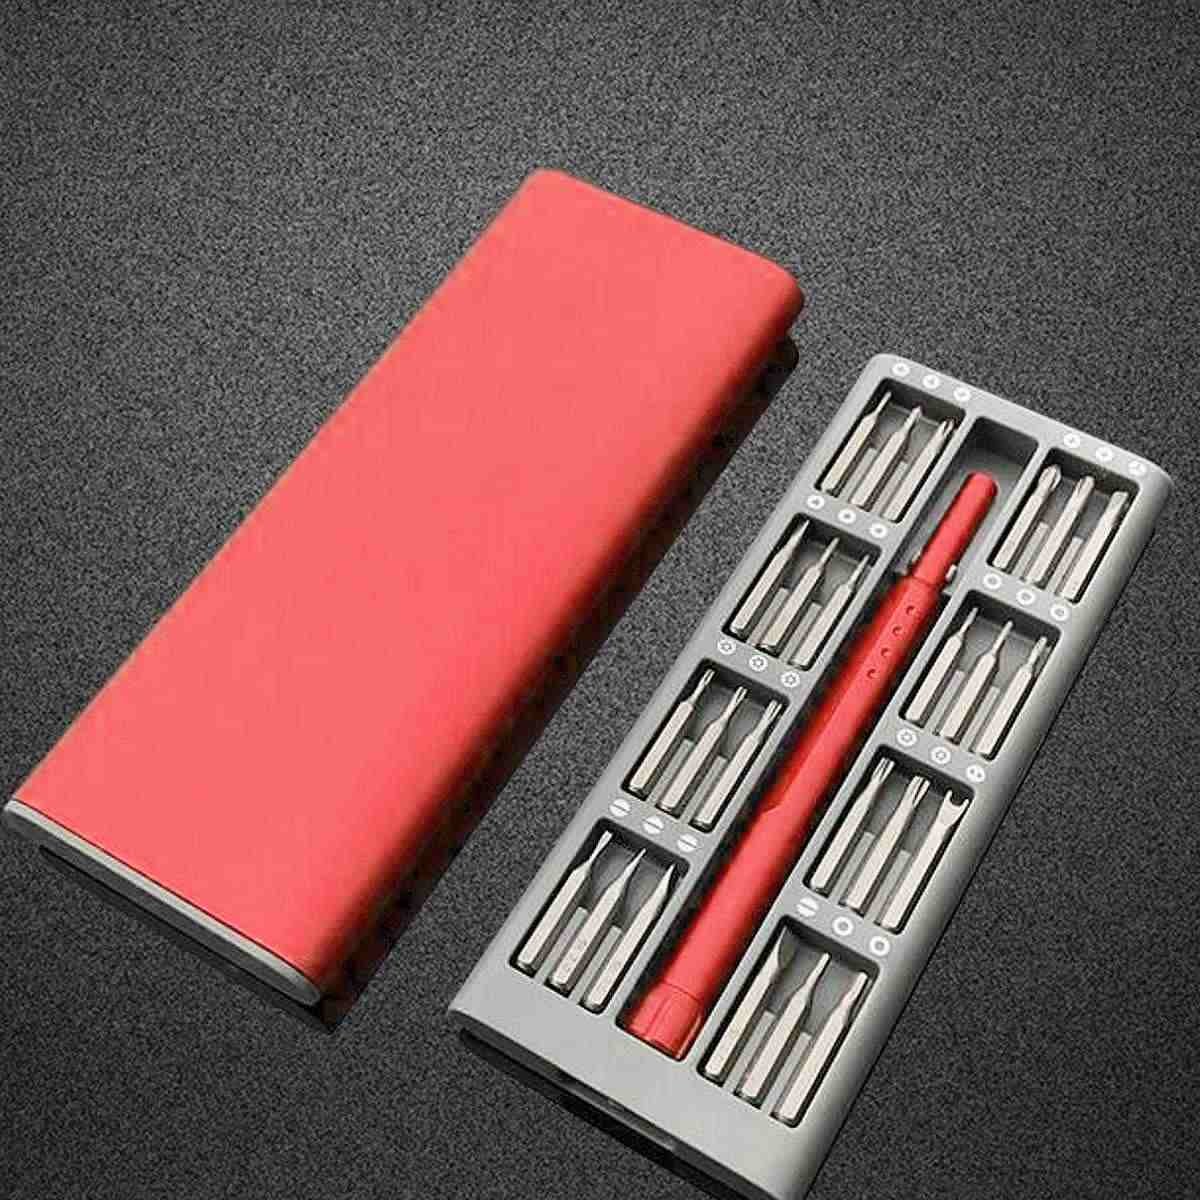 Xiaomi Mijia Wiha Daily Use Red Mini Screwdriver Kit 25 Precision Magnetic Bits Box Screw Driver xiaomi Smart Home Set Tools